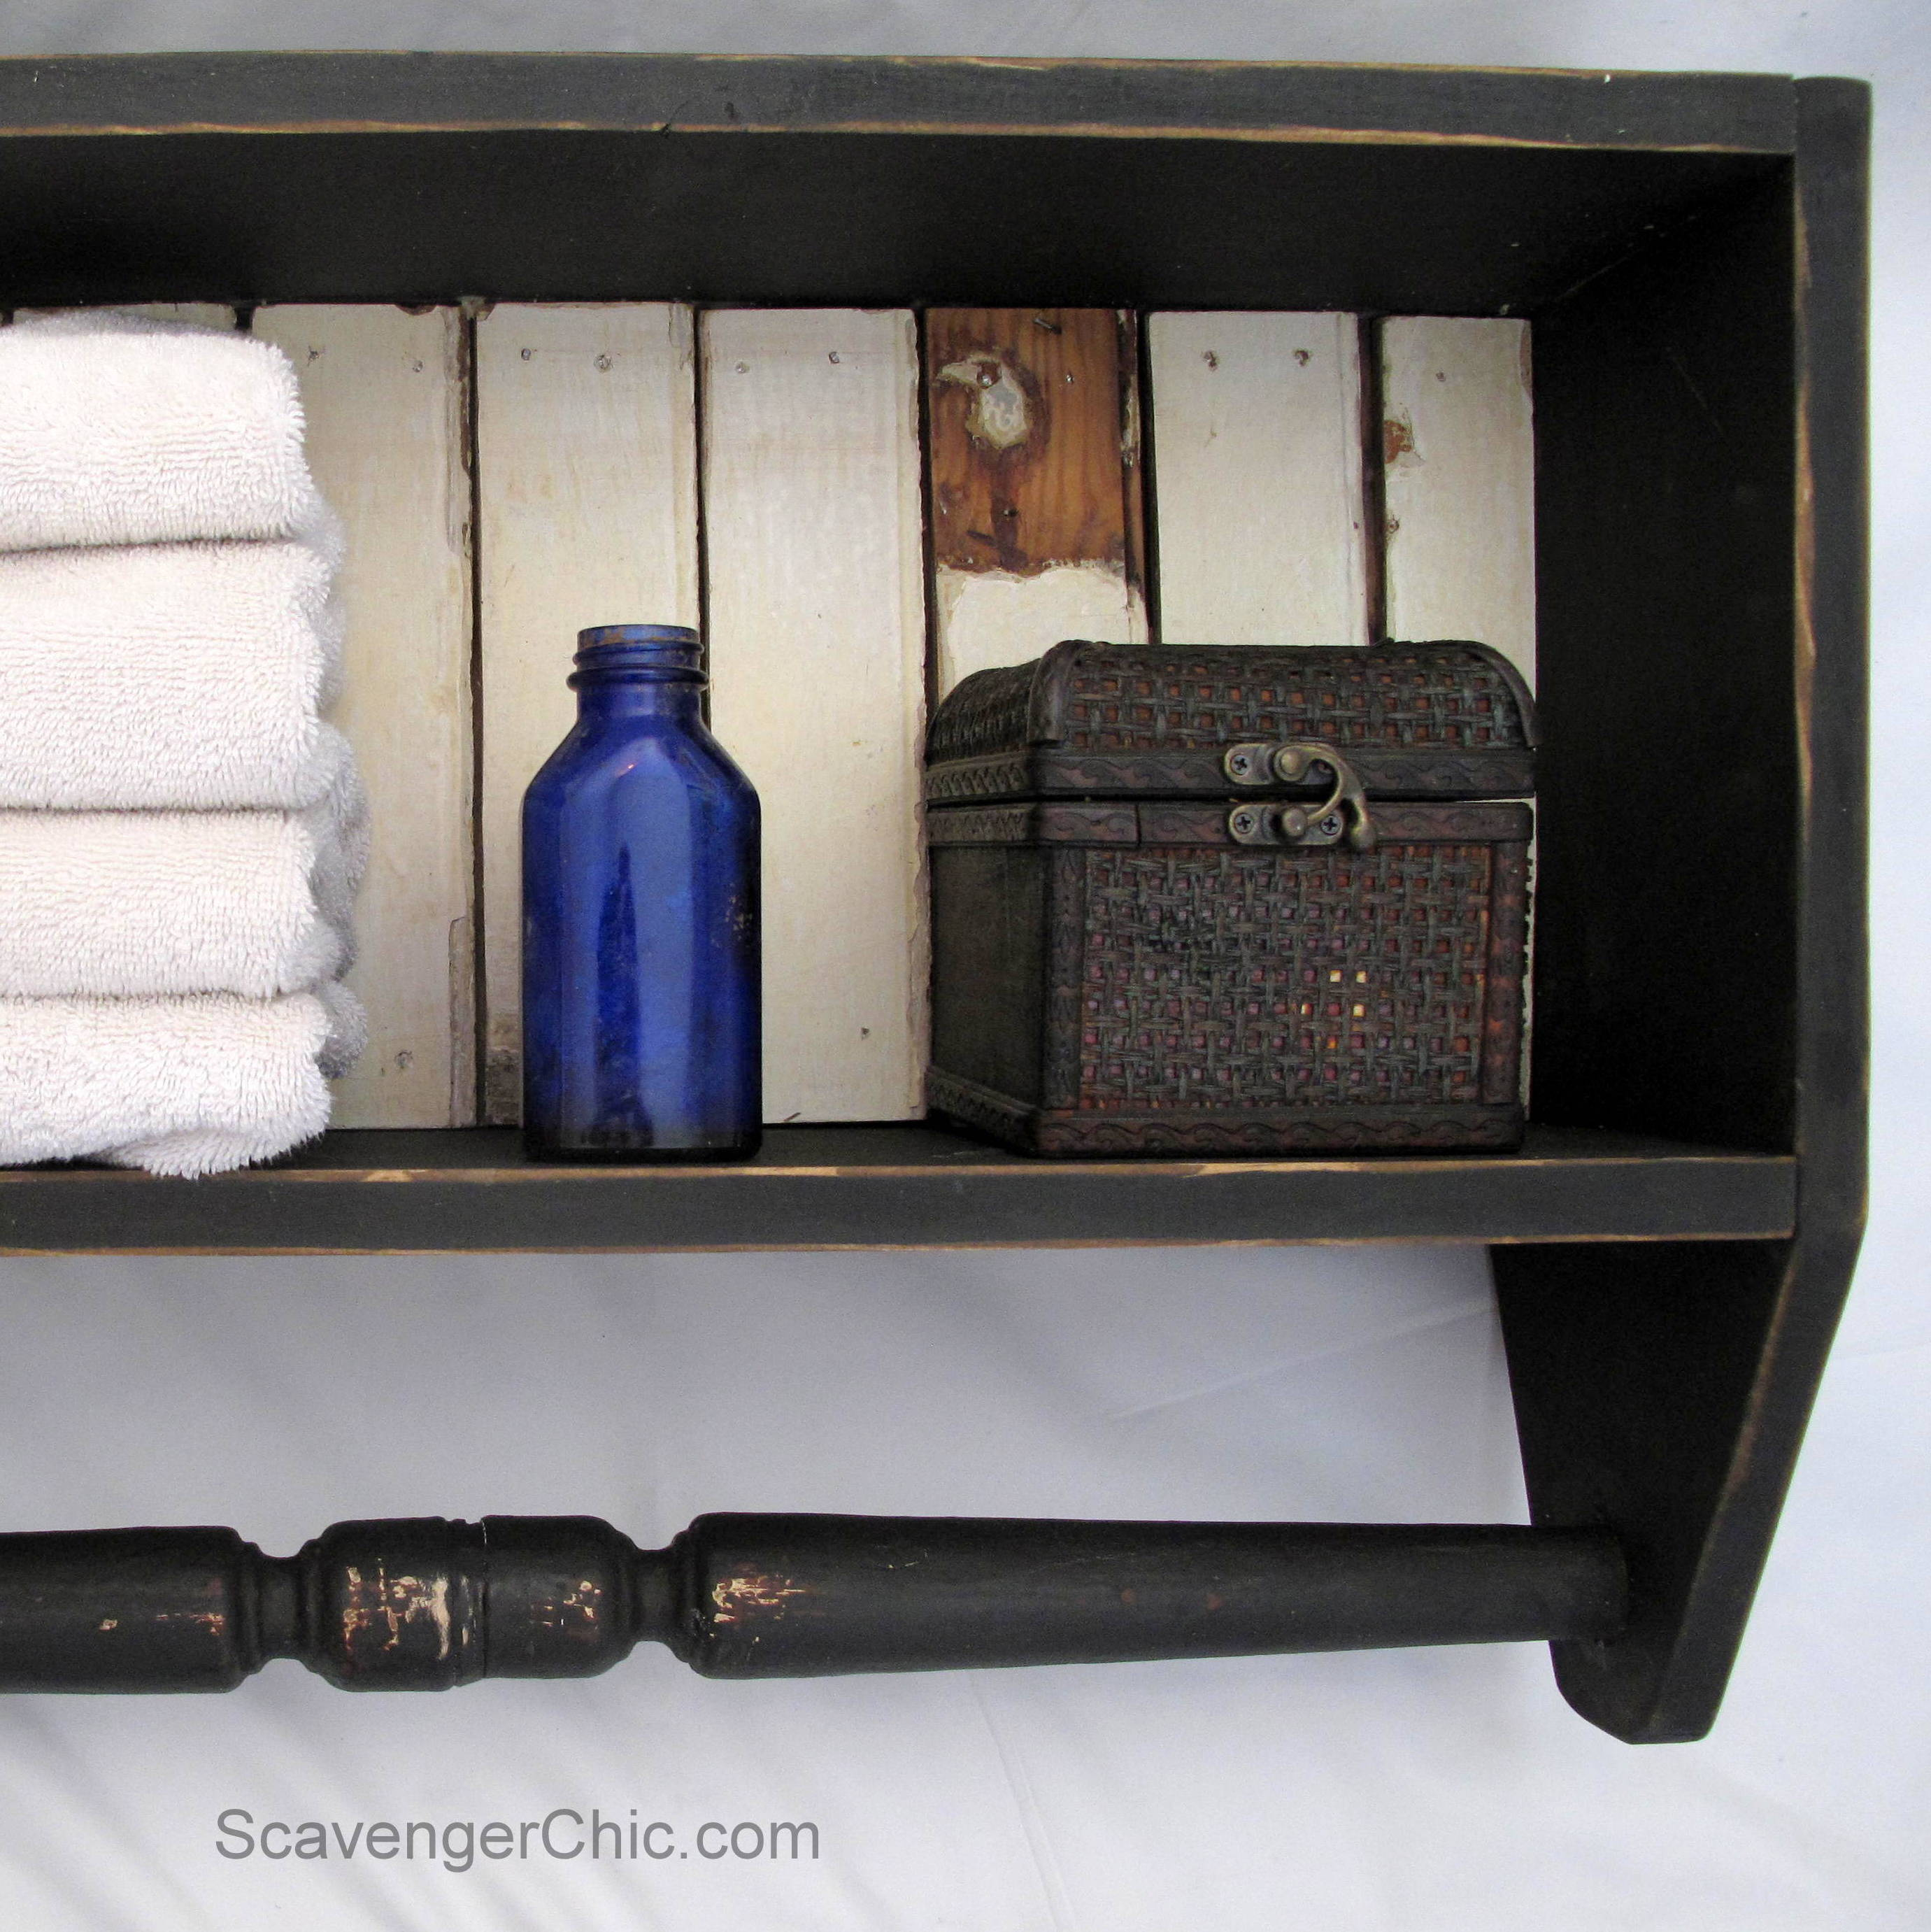 Build an Easy Bathroom Shelf - Scavenger Chic